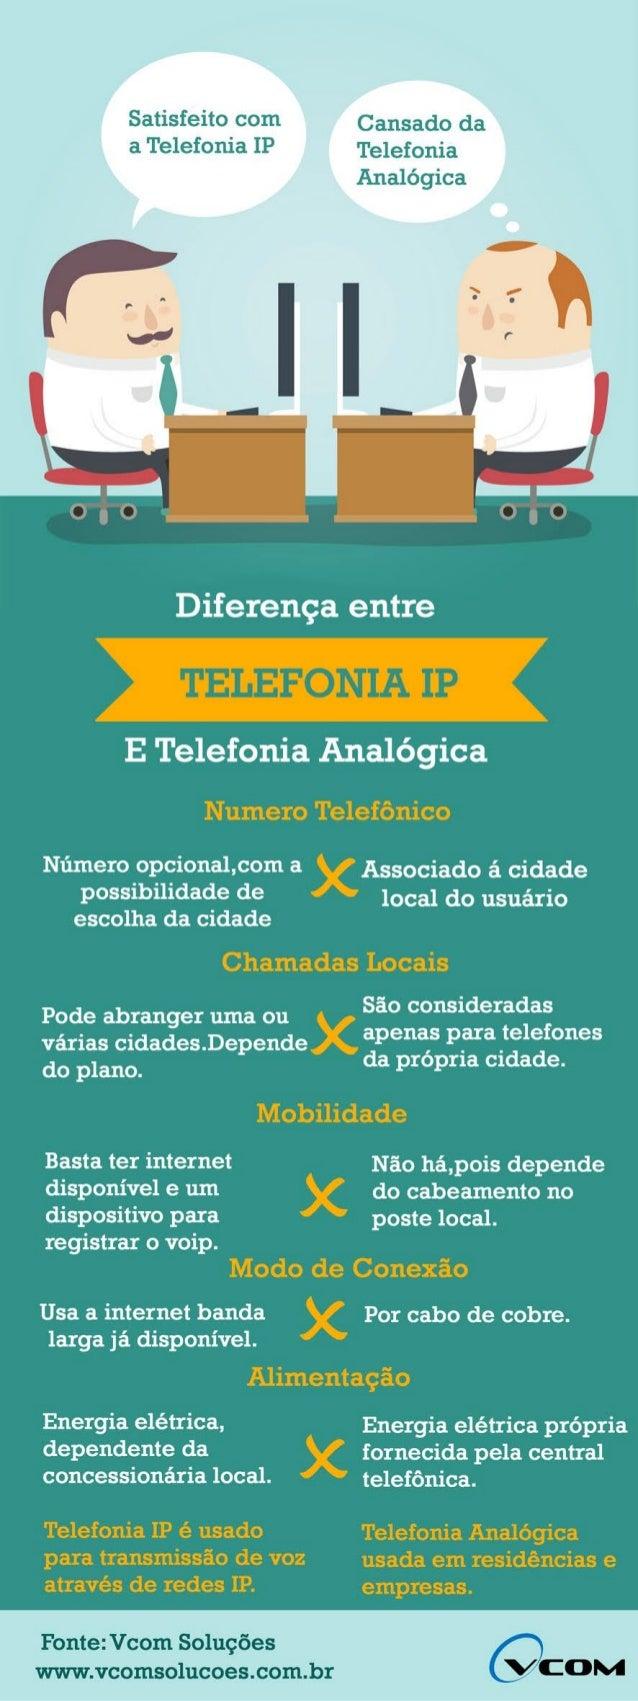 Infográfico Telefonia IP x Telefonia Analógica